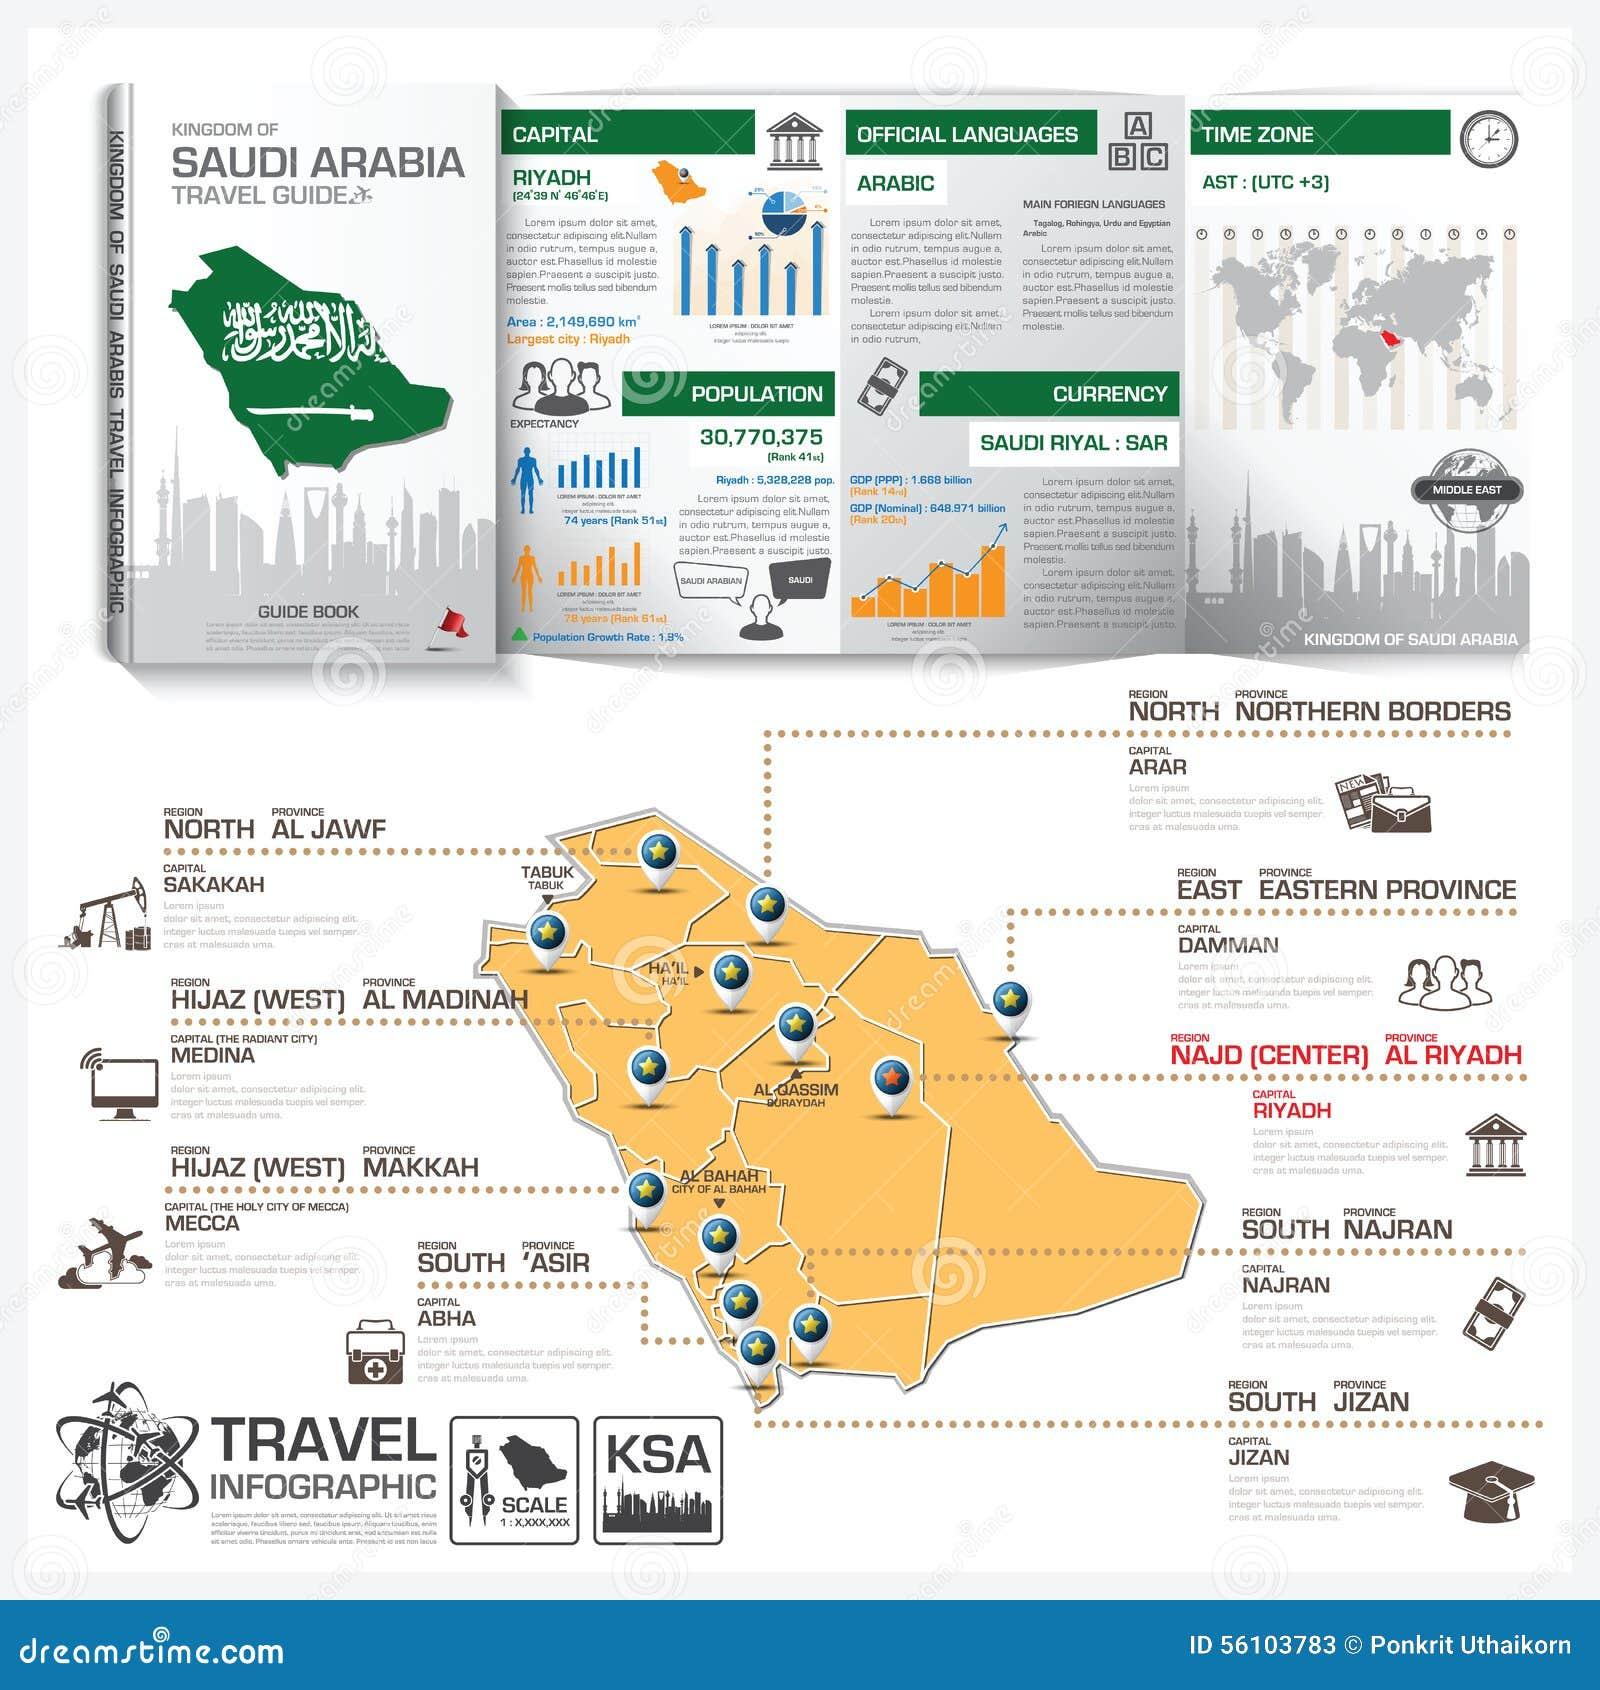 Kingdom Of Saudi Arabia Travel Guide Book Business Infographic W